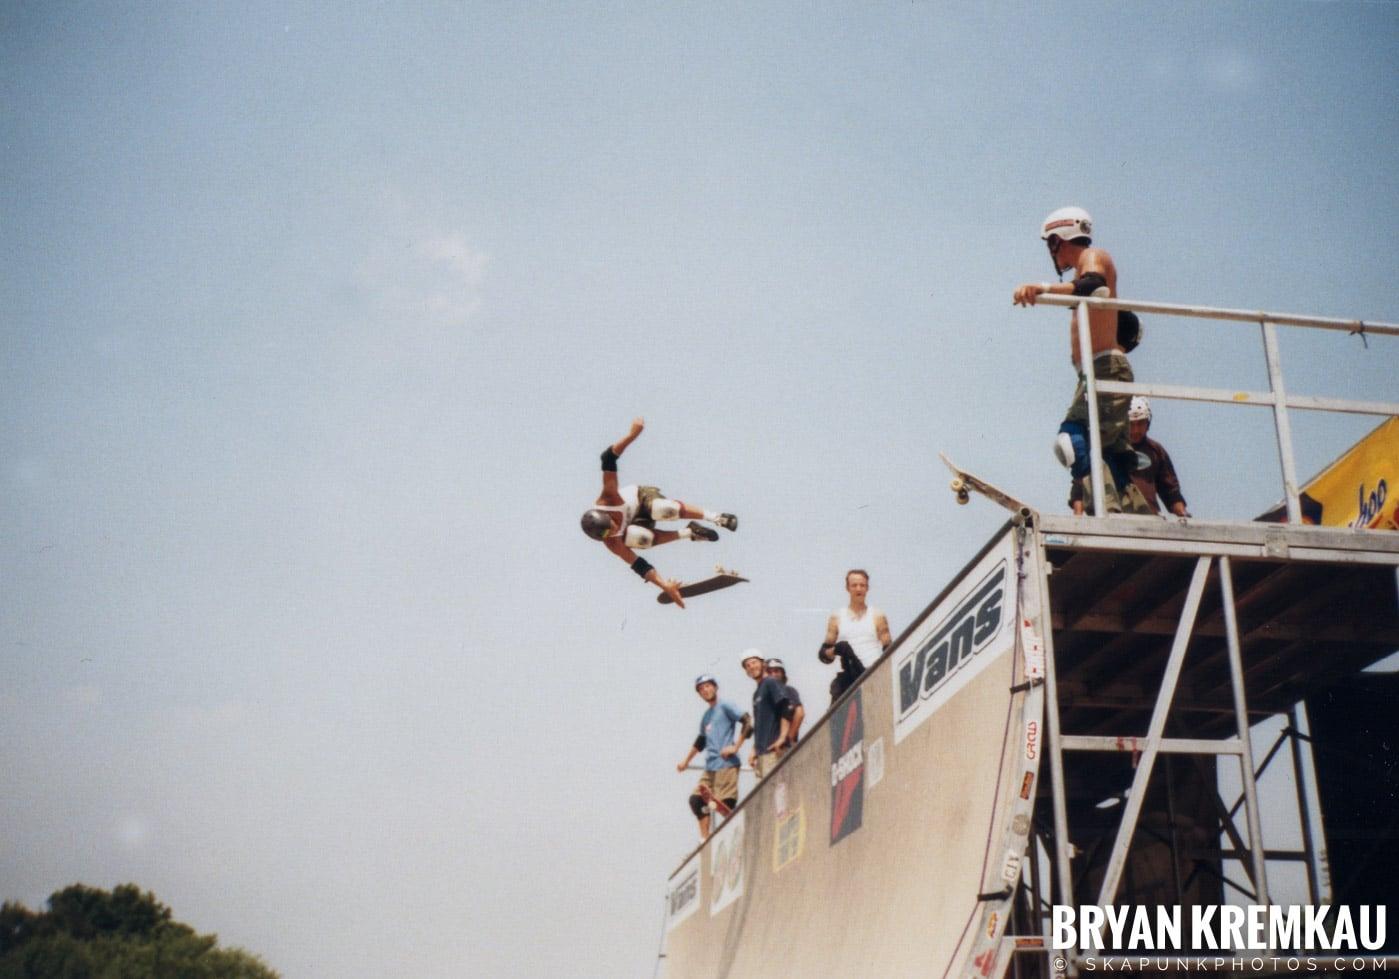 Skaters @ Vans Warped Tour, Randall's Island, NYC - 7.16.99 (12)